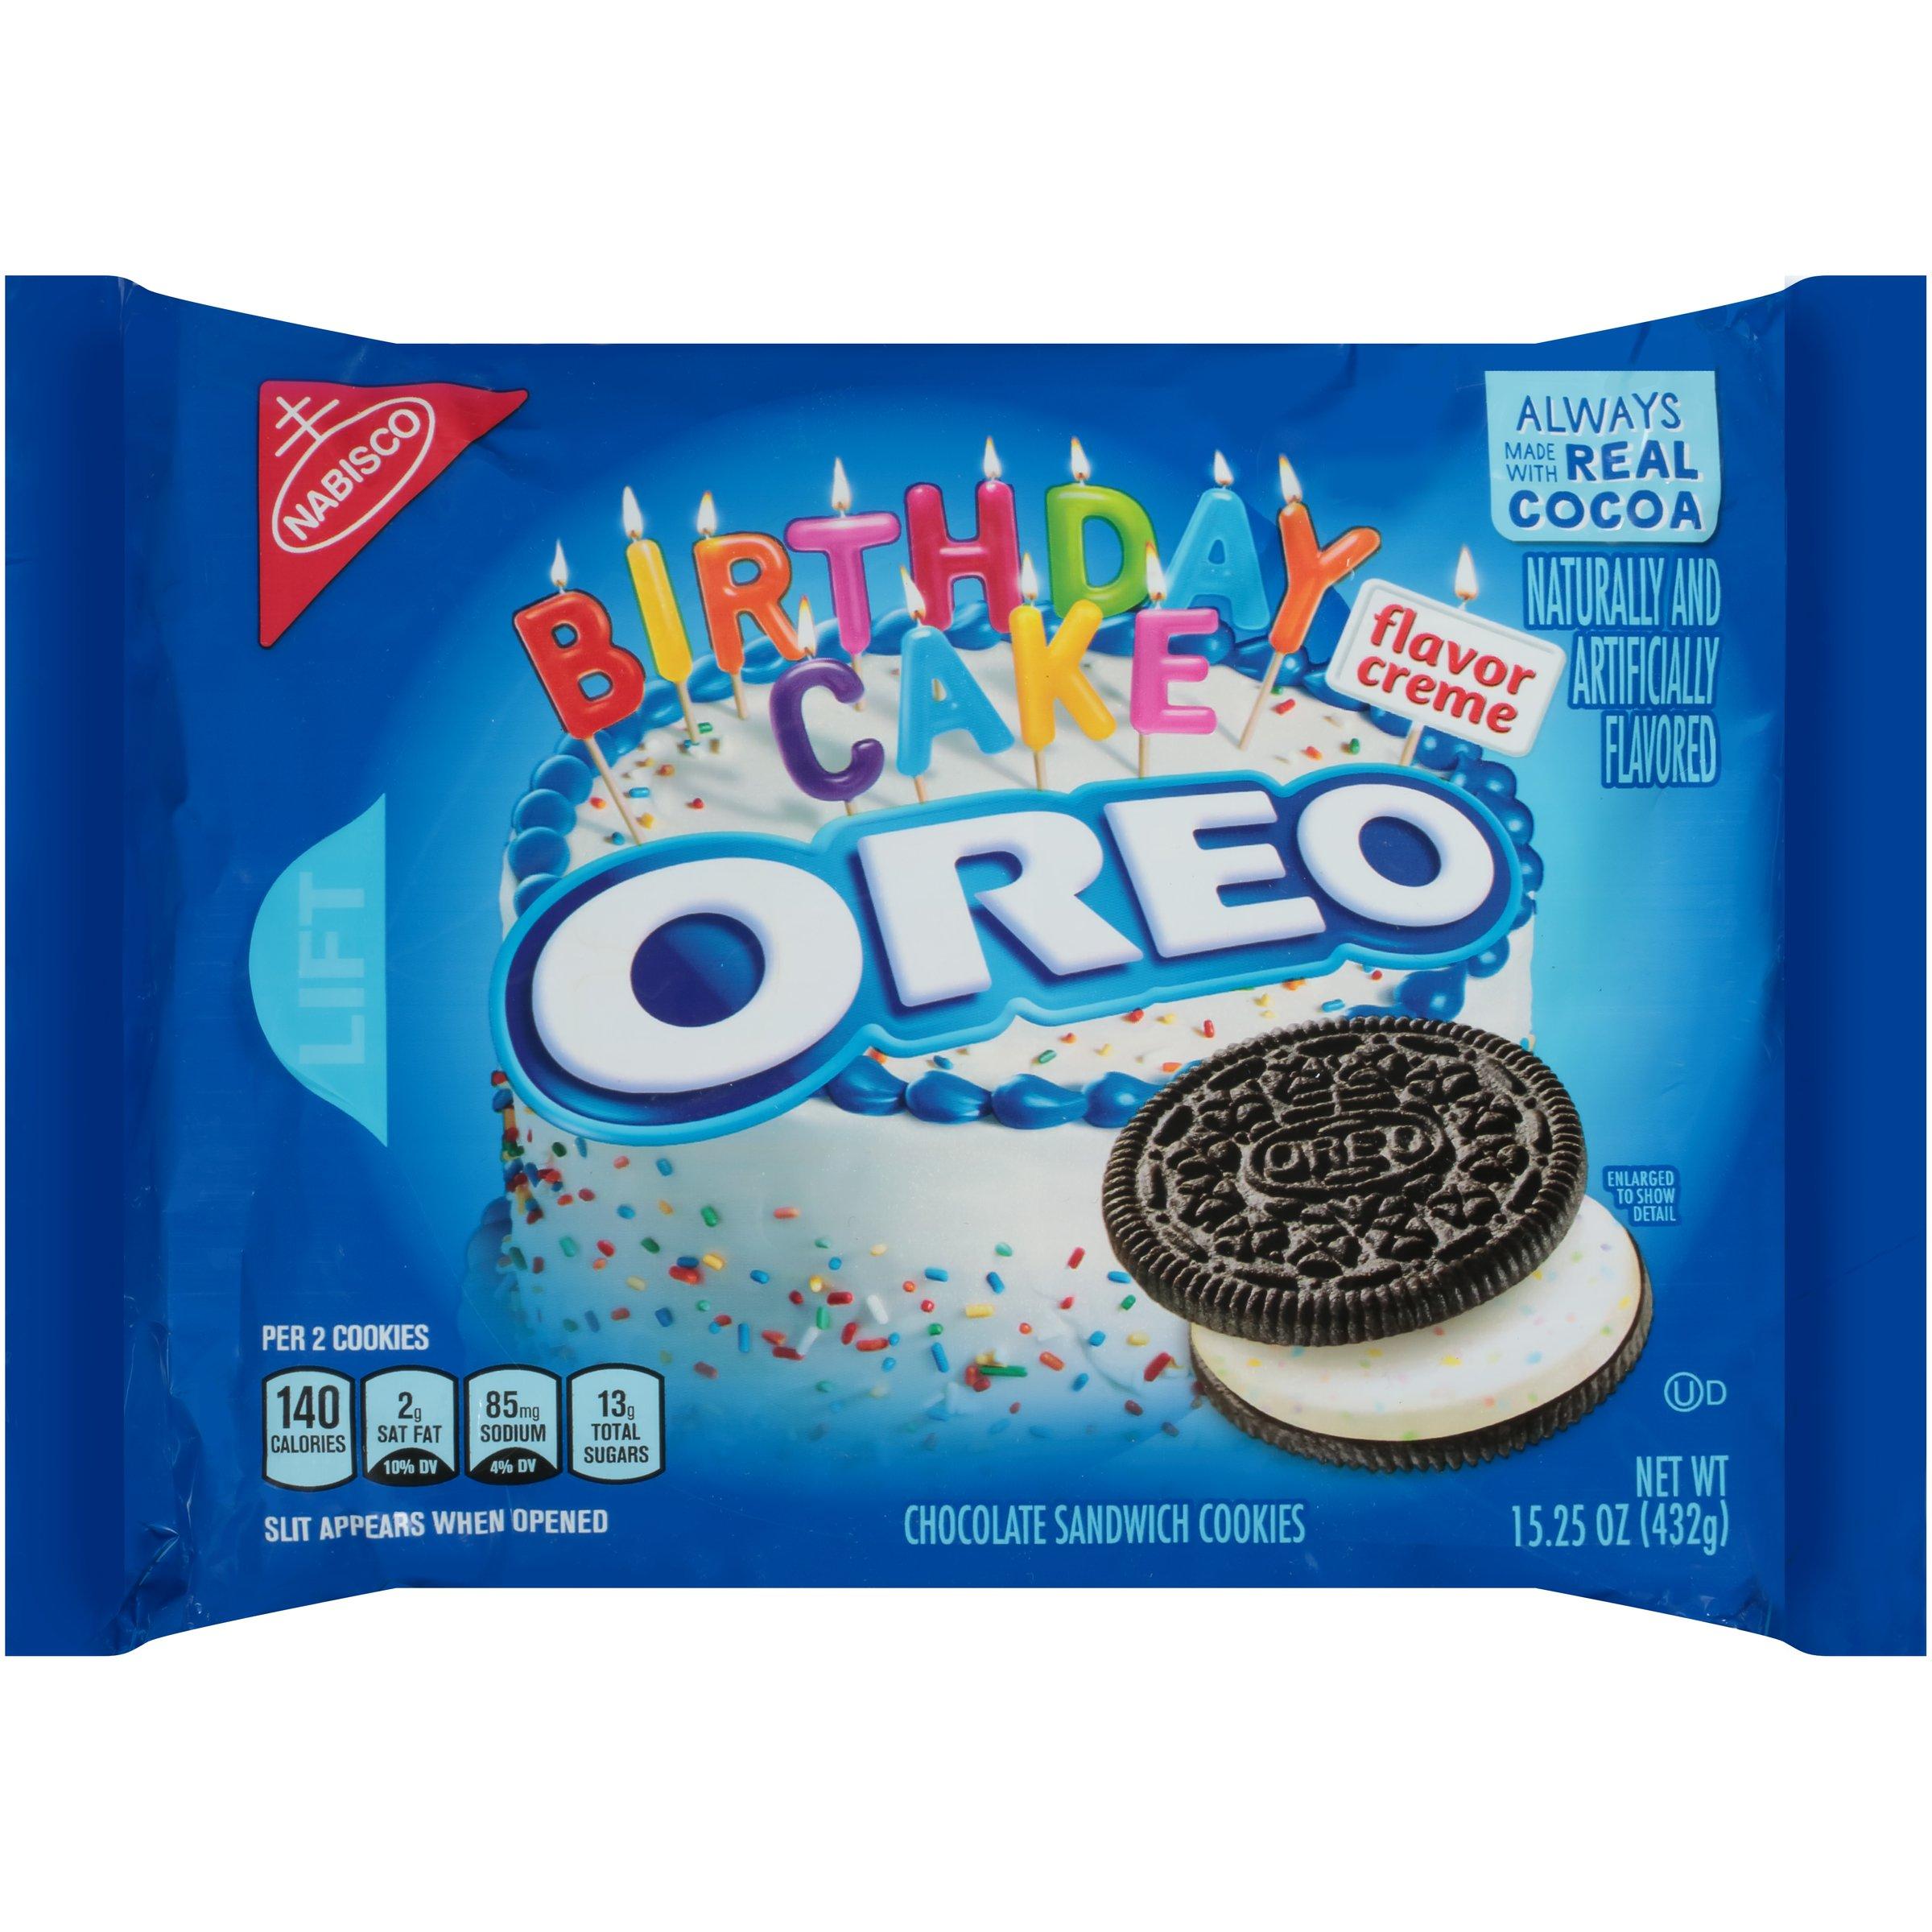 Remarkable Nabisco Oreo Birthday Cake Flavor Creme Chocolate Sandwich Cookies Funny Birthday Cards Online Elaedamsfinfo